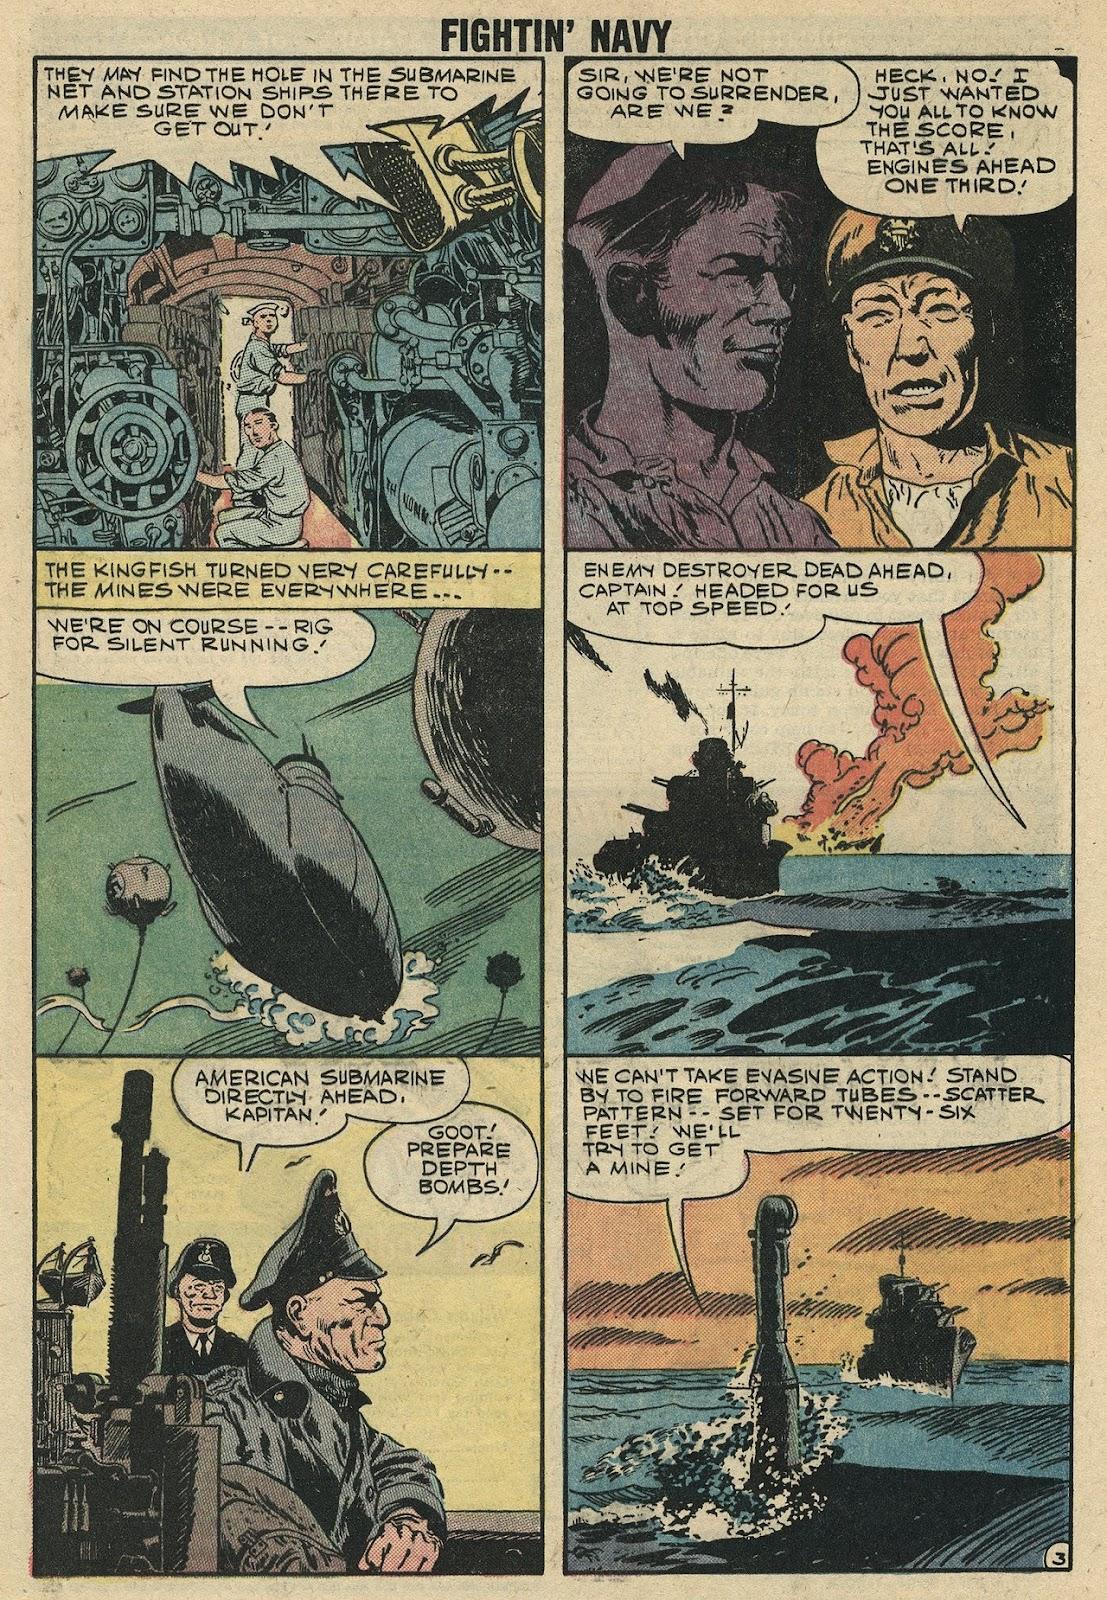 Read online Fightin' Navy comic -  Issue #86 - 5